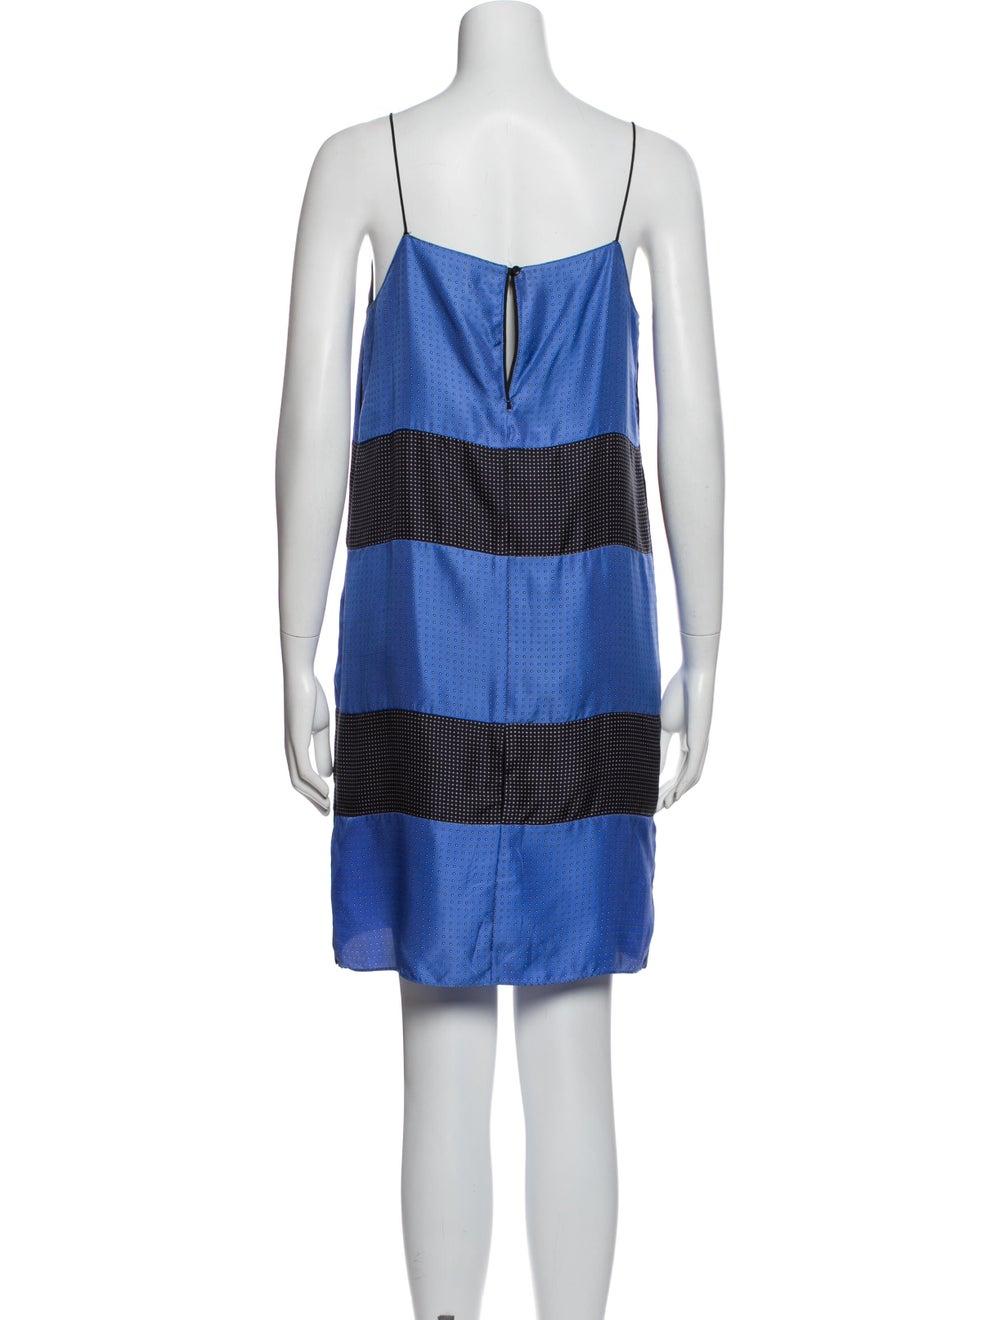 Rag & Bone Silk Mini Dress Blue - image 3